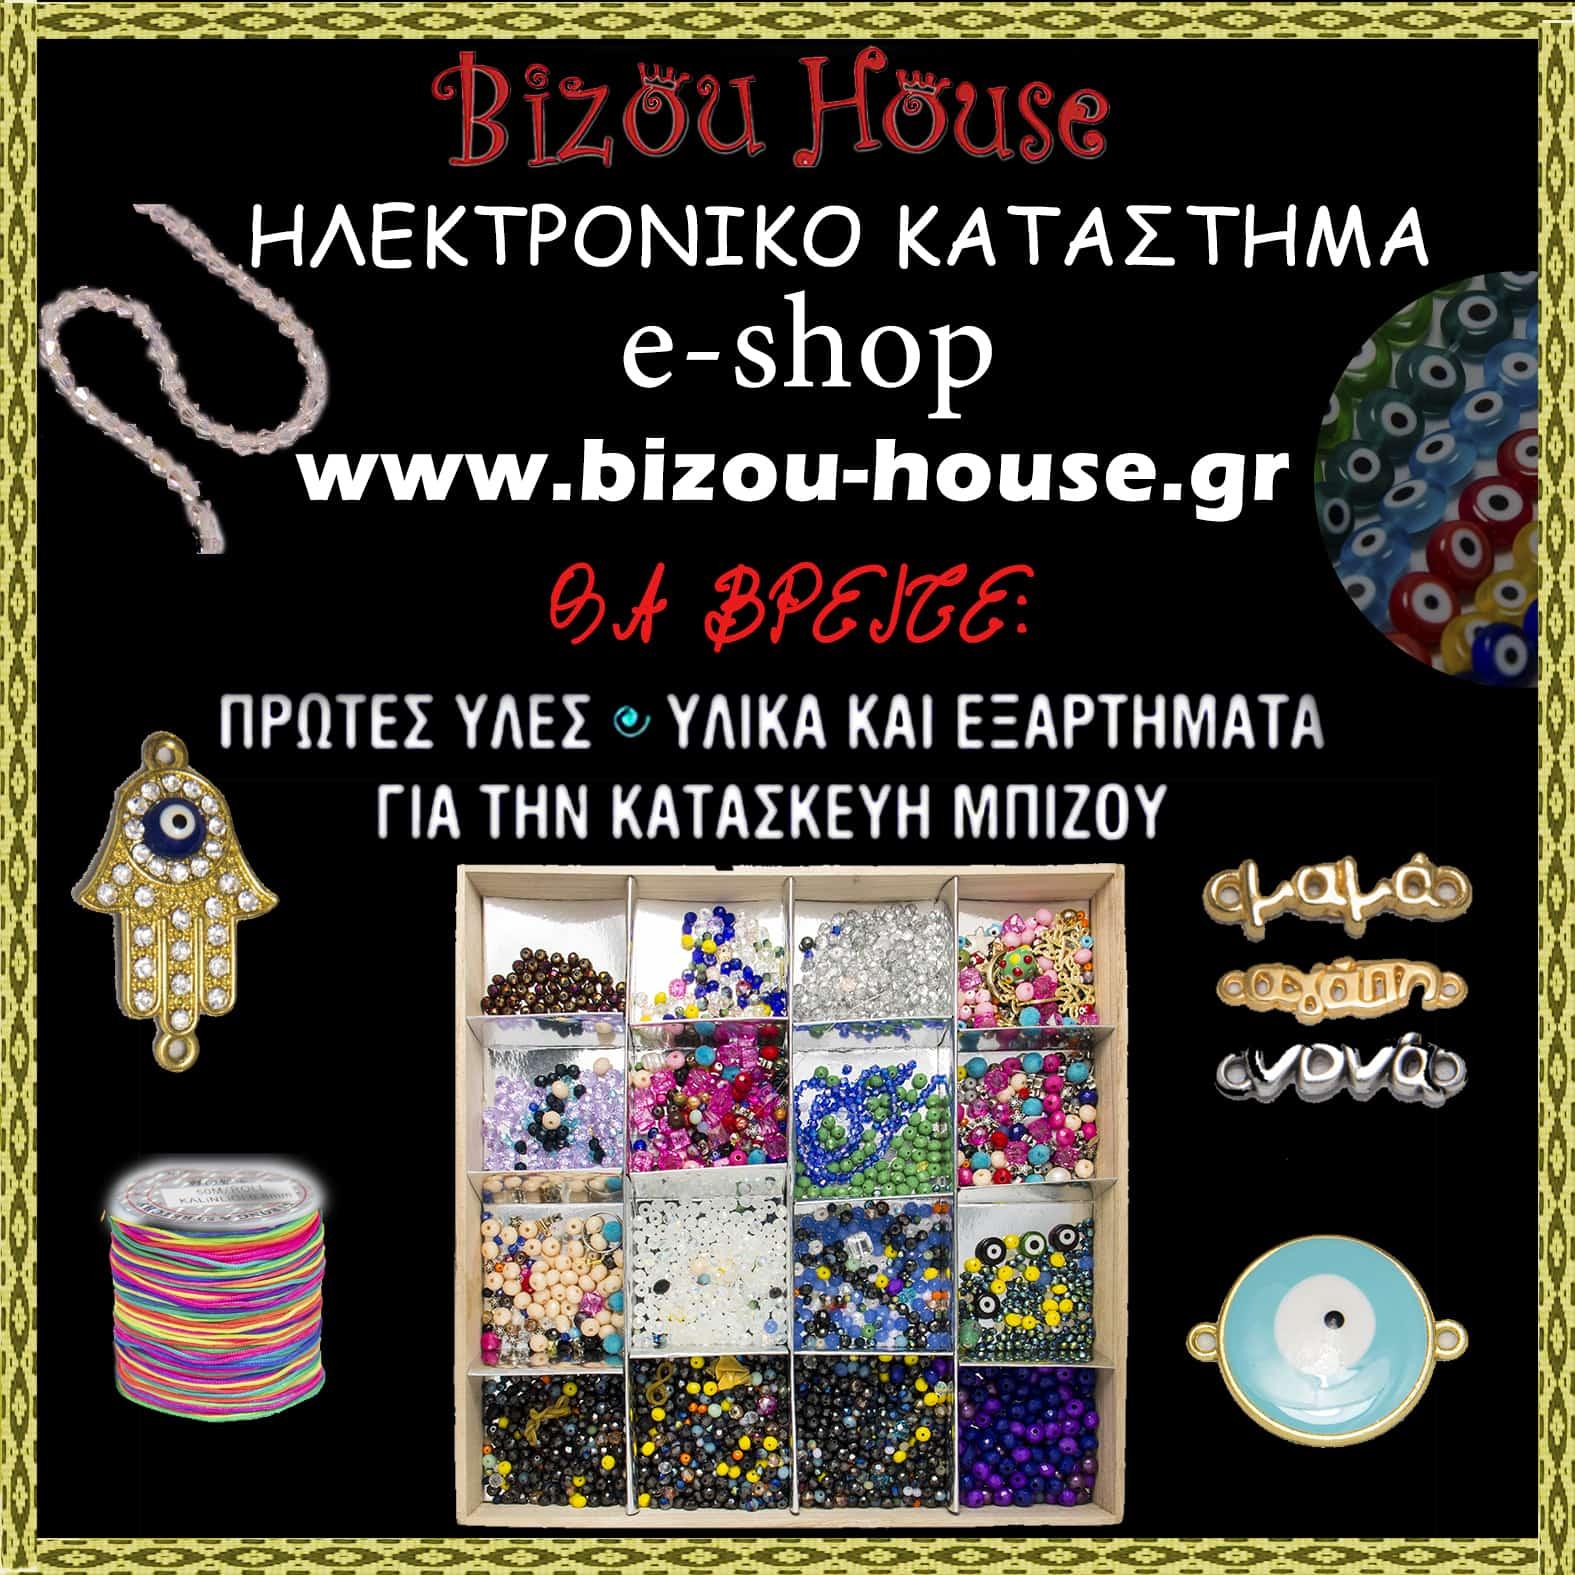 Bizou House: Υλικά για χειροποίητο κόσμημα 10